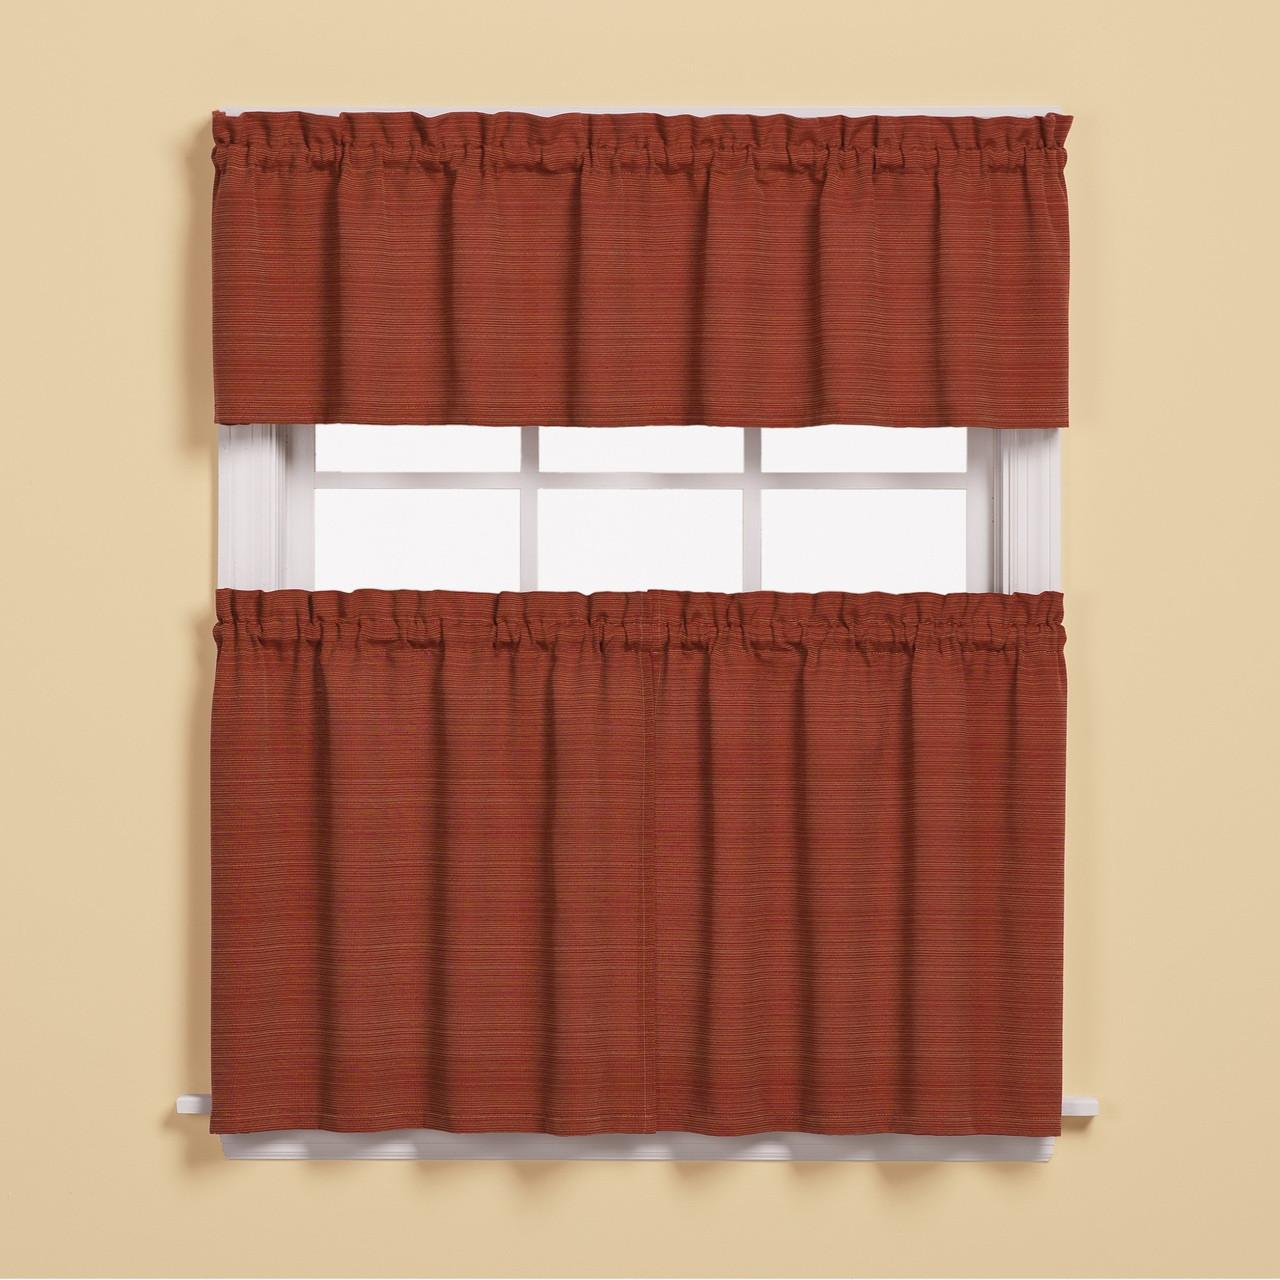 New Kitchen Curtains For Less: Austin Kitchen Curtain